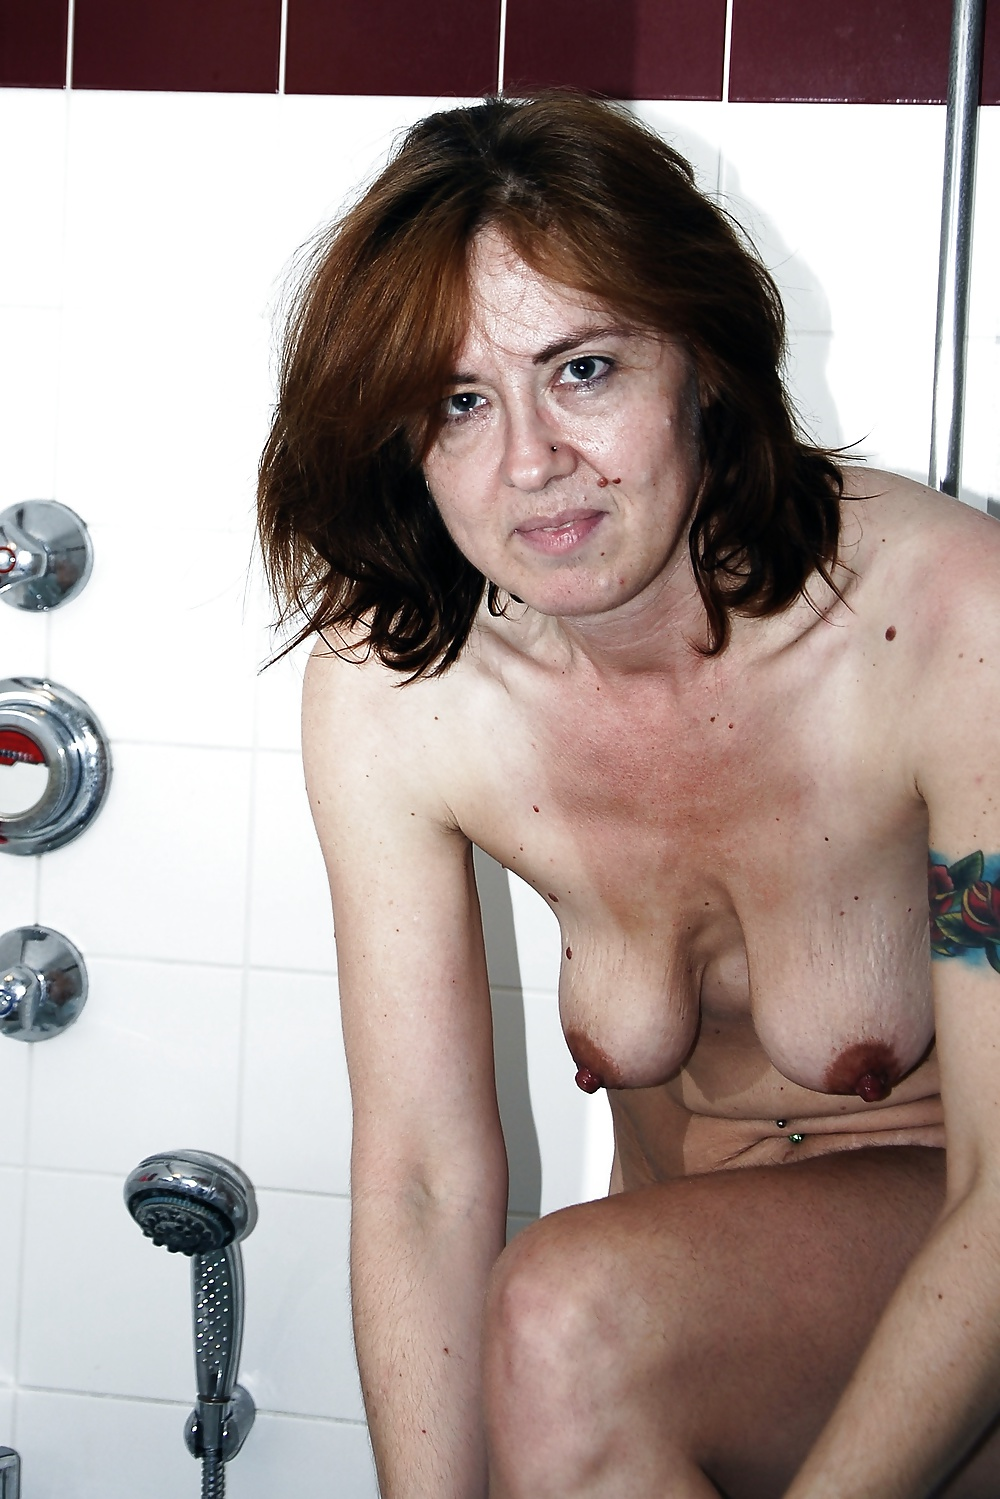 Nude girl on meth